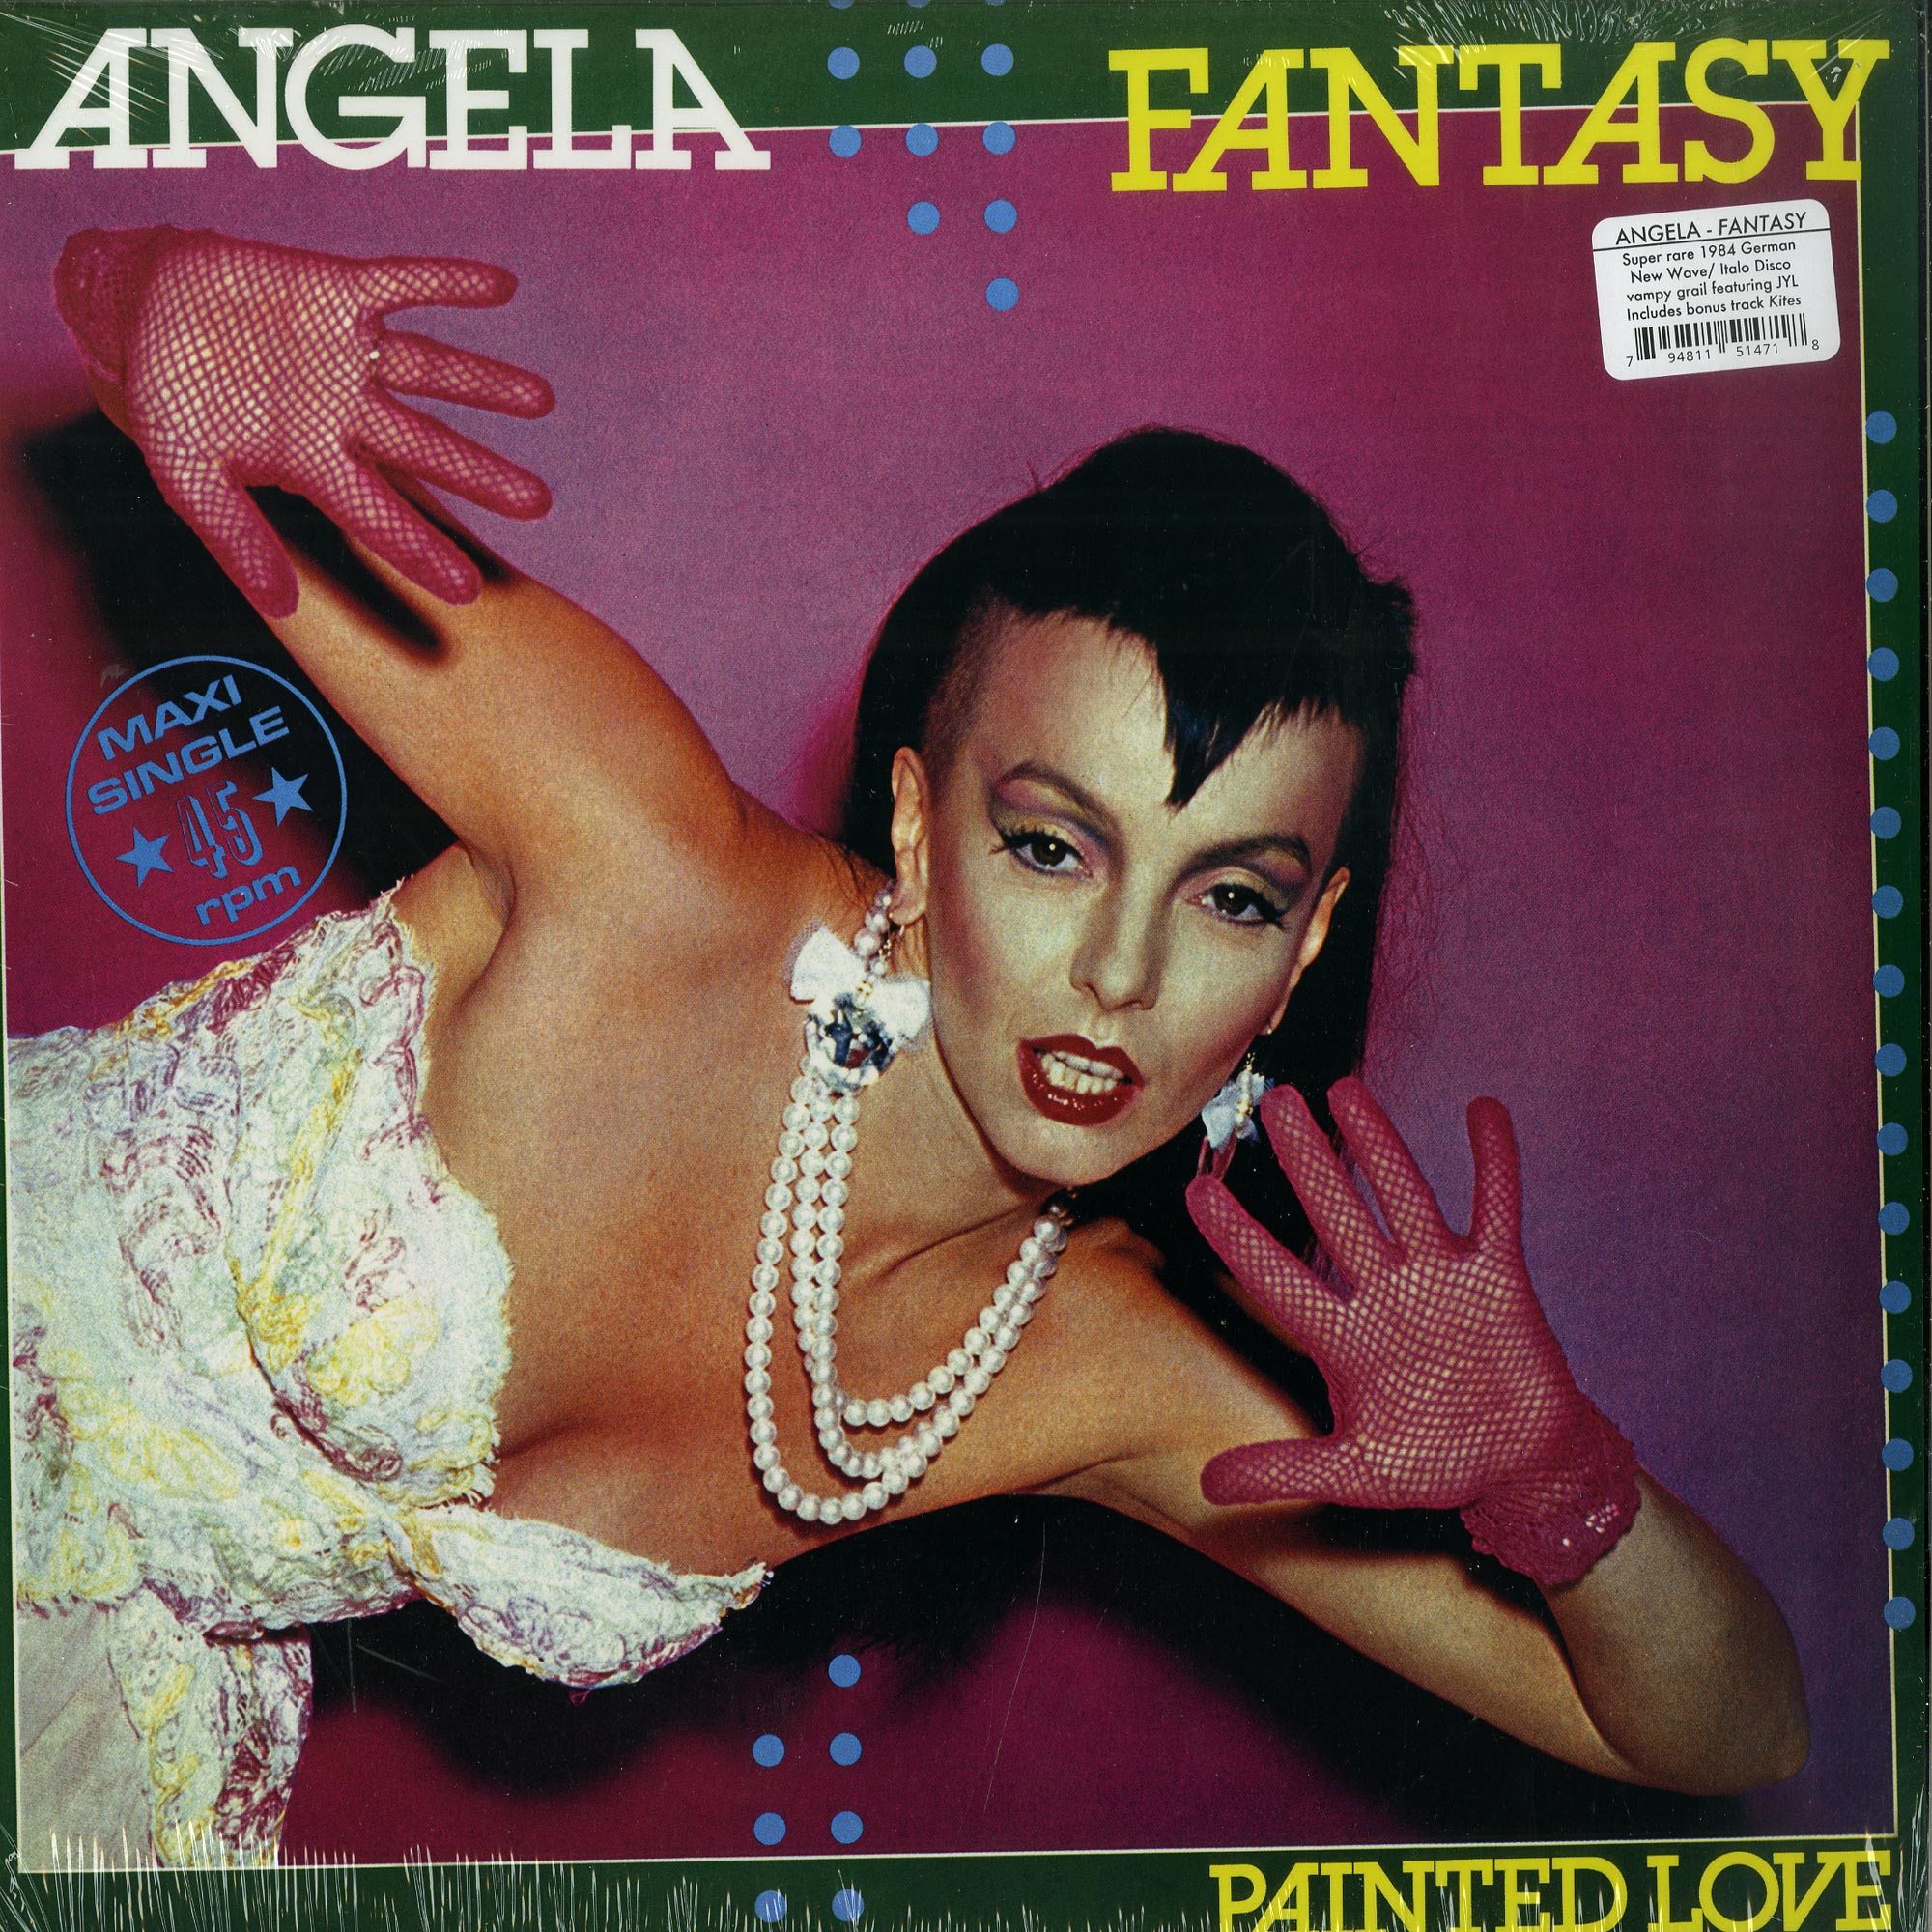 Angela - FANTASY